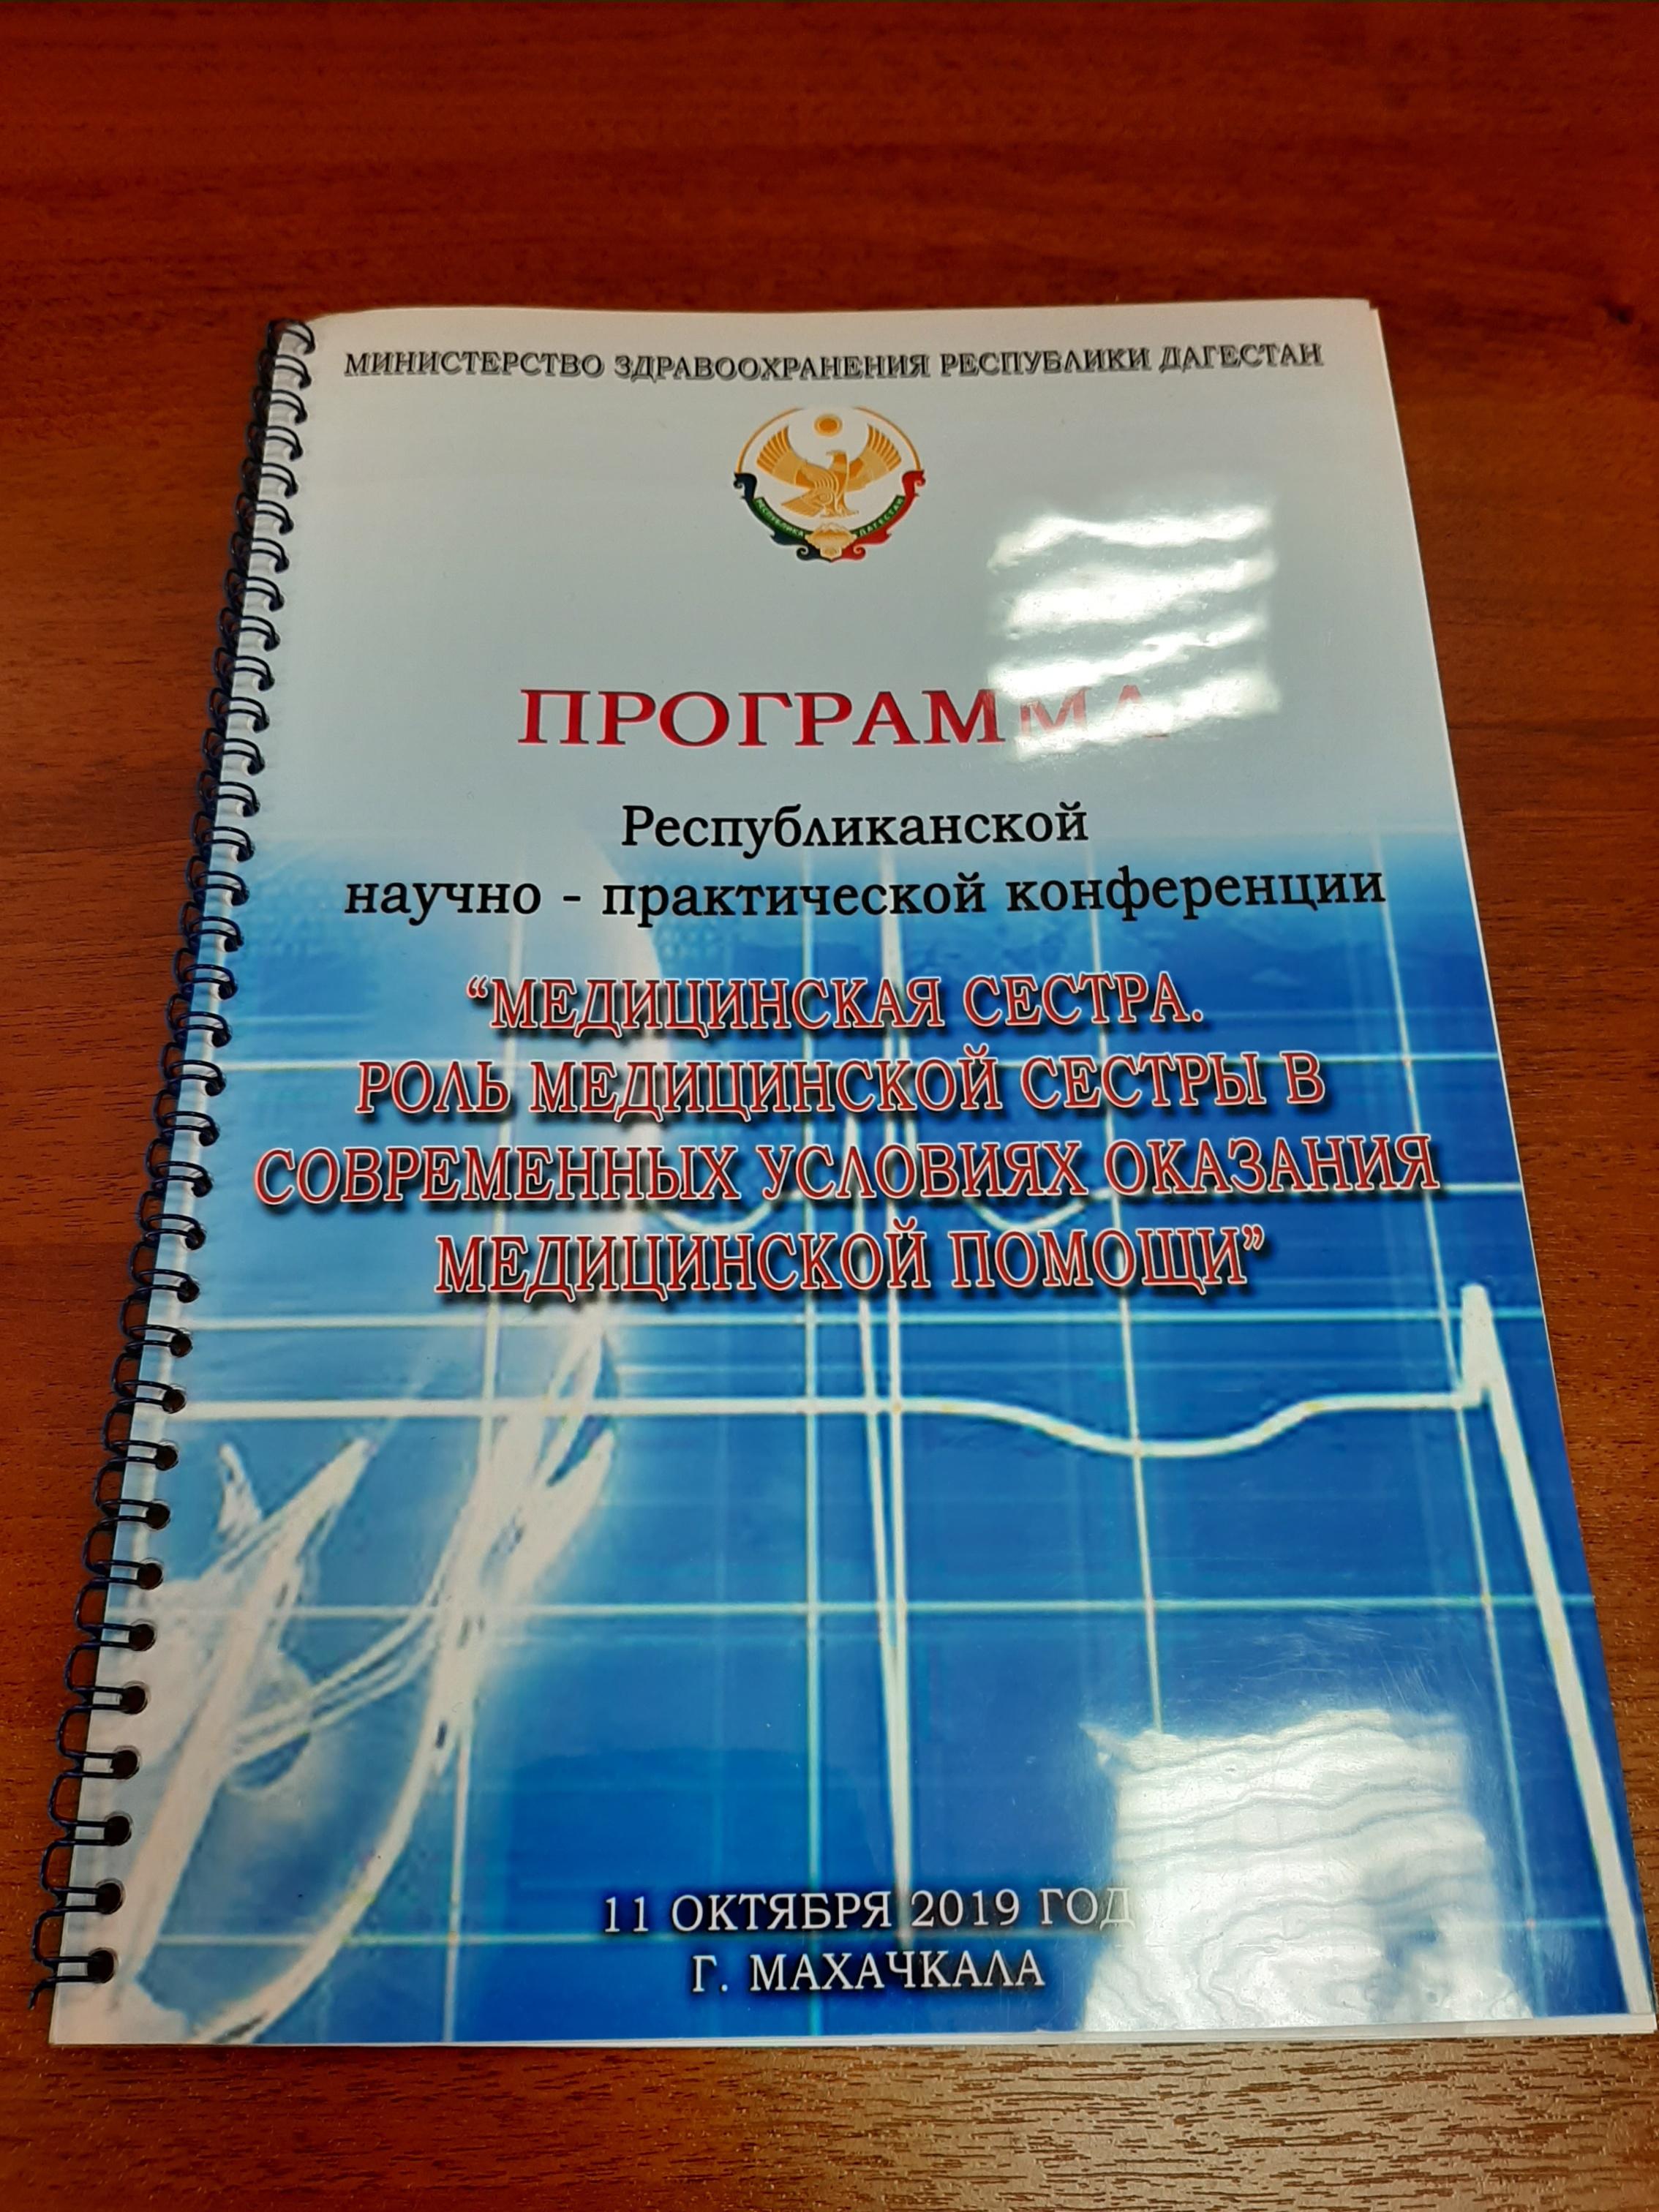 программа конференции для медсестер в дагестане